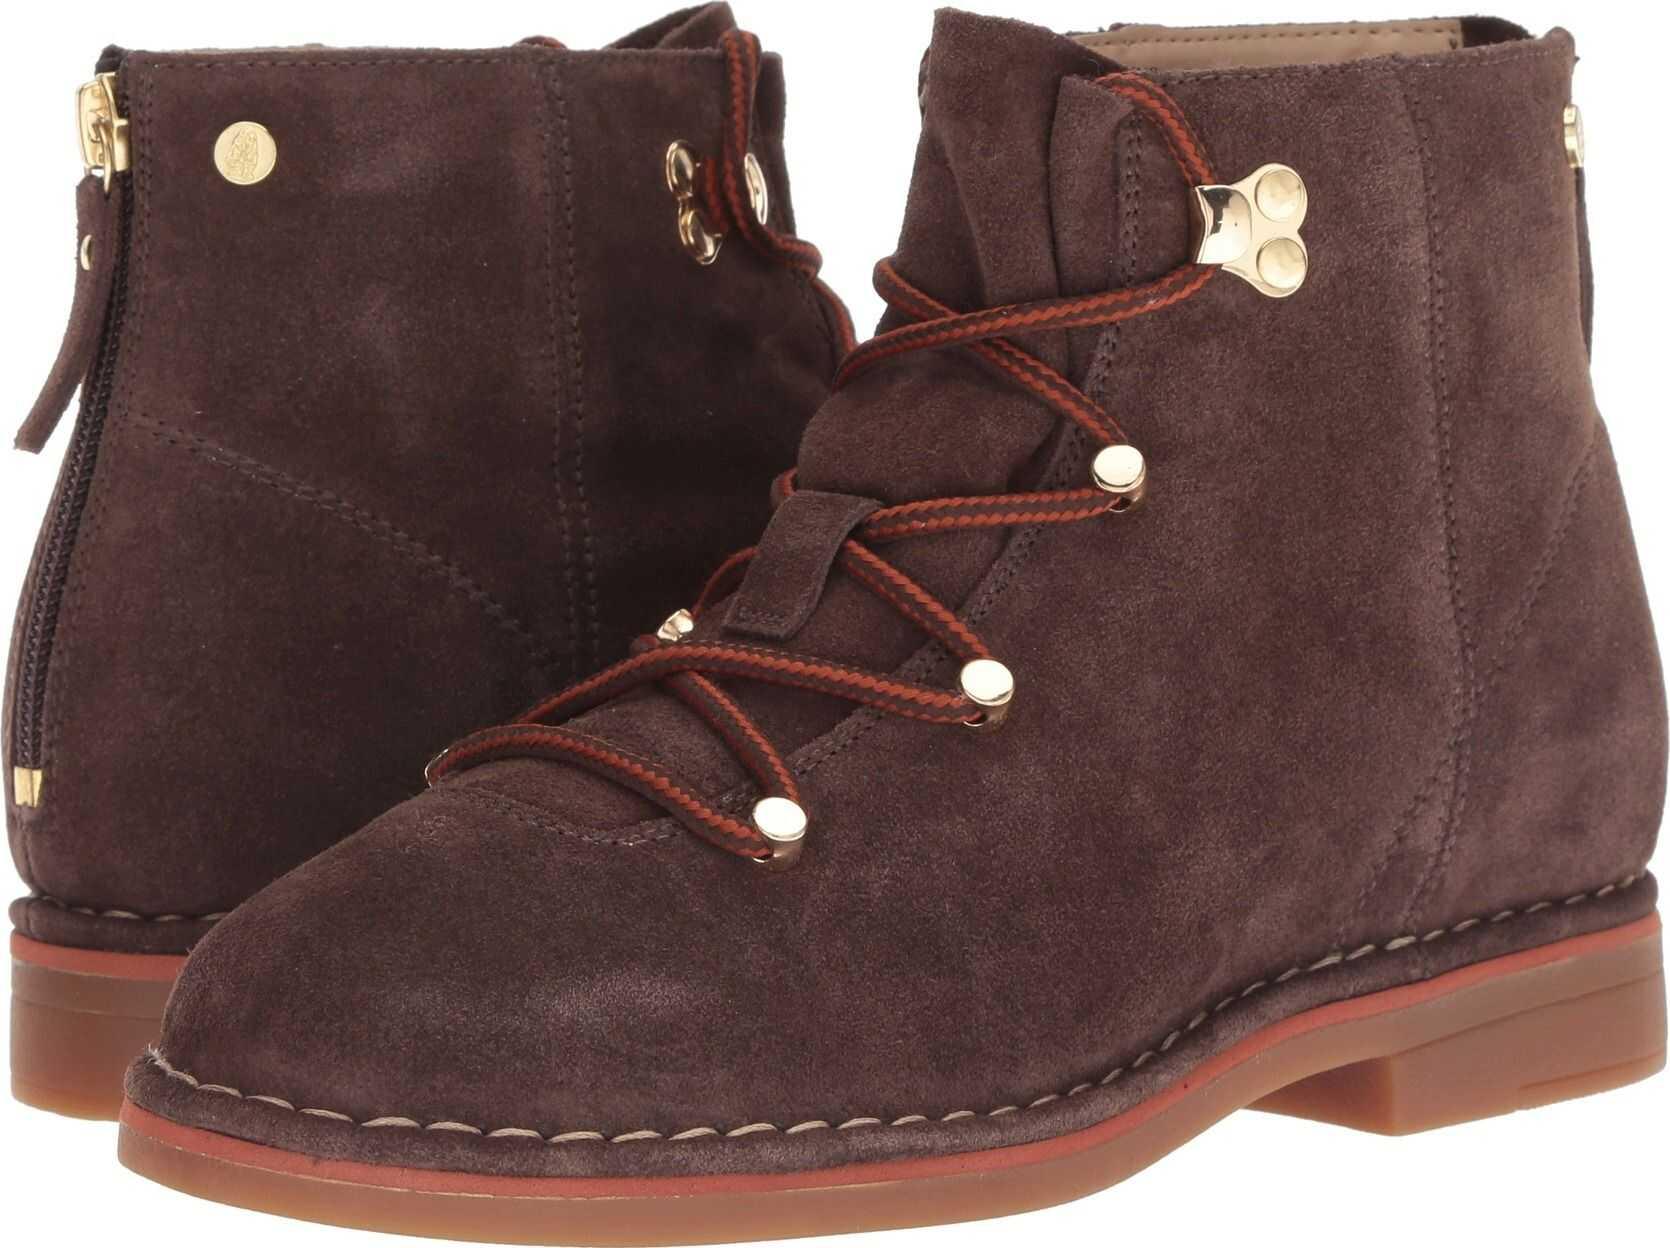 Hush Puppies Catelyn Hiker Boot Dark Brown Suede